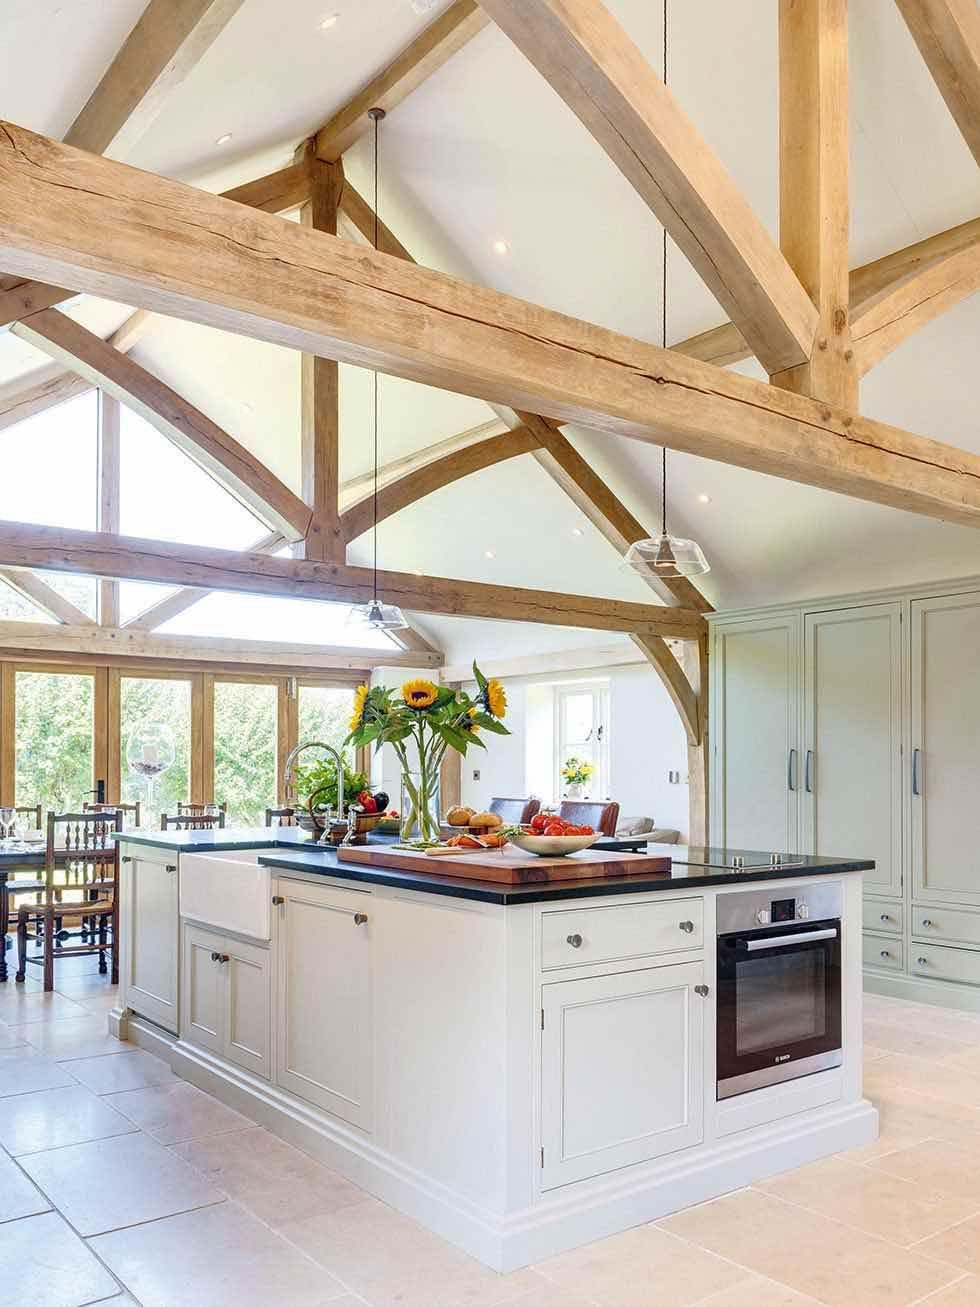 Welsh Oak Frame kitchen extension | Creating Space | Pinterest ...